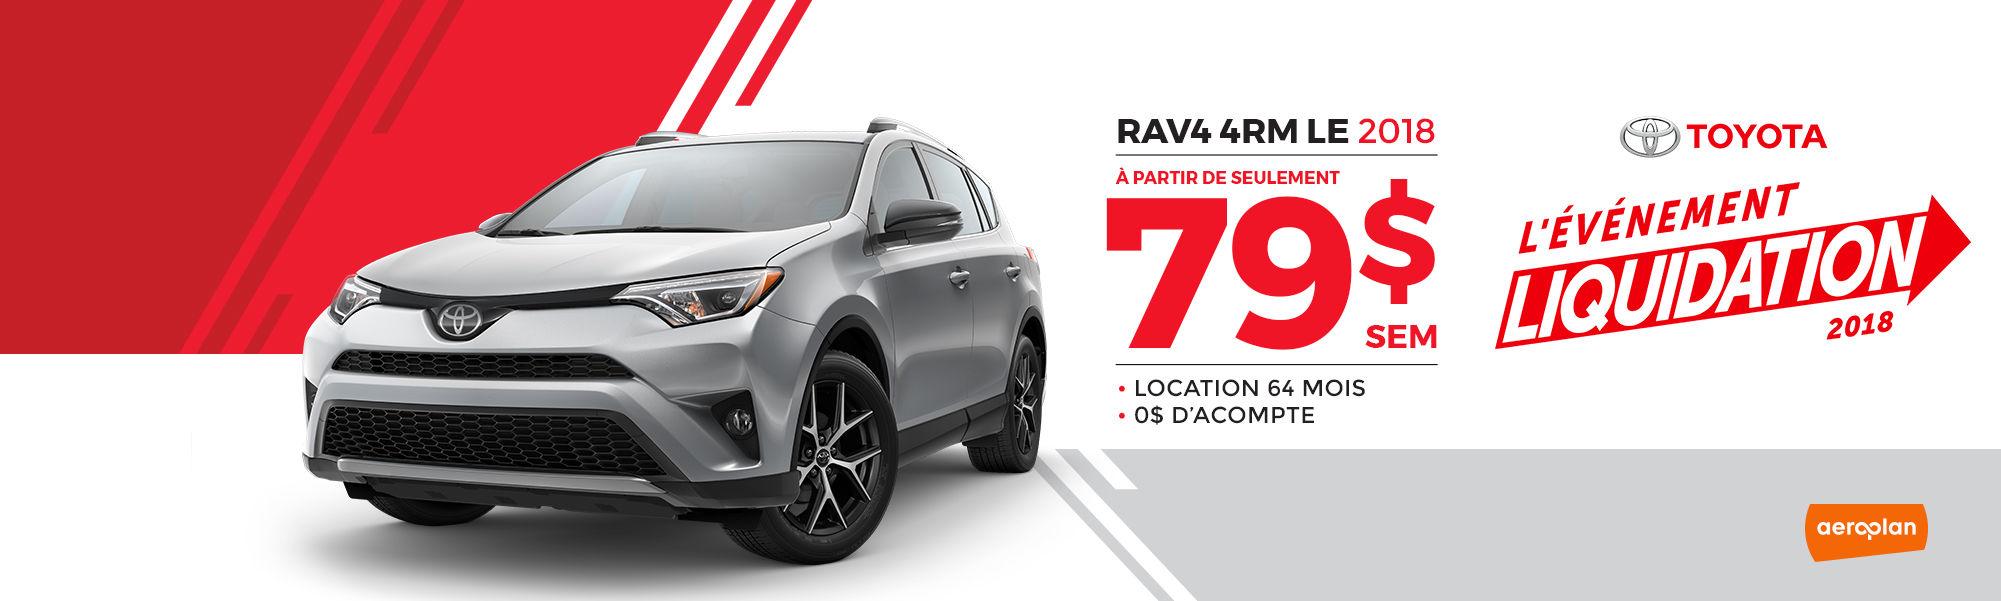 RAV4 4RM LE 2018